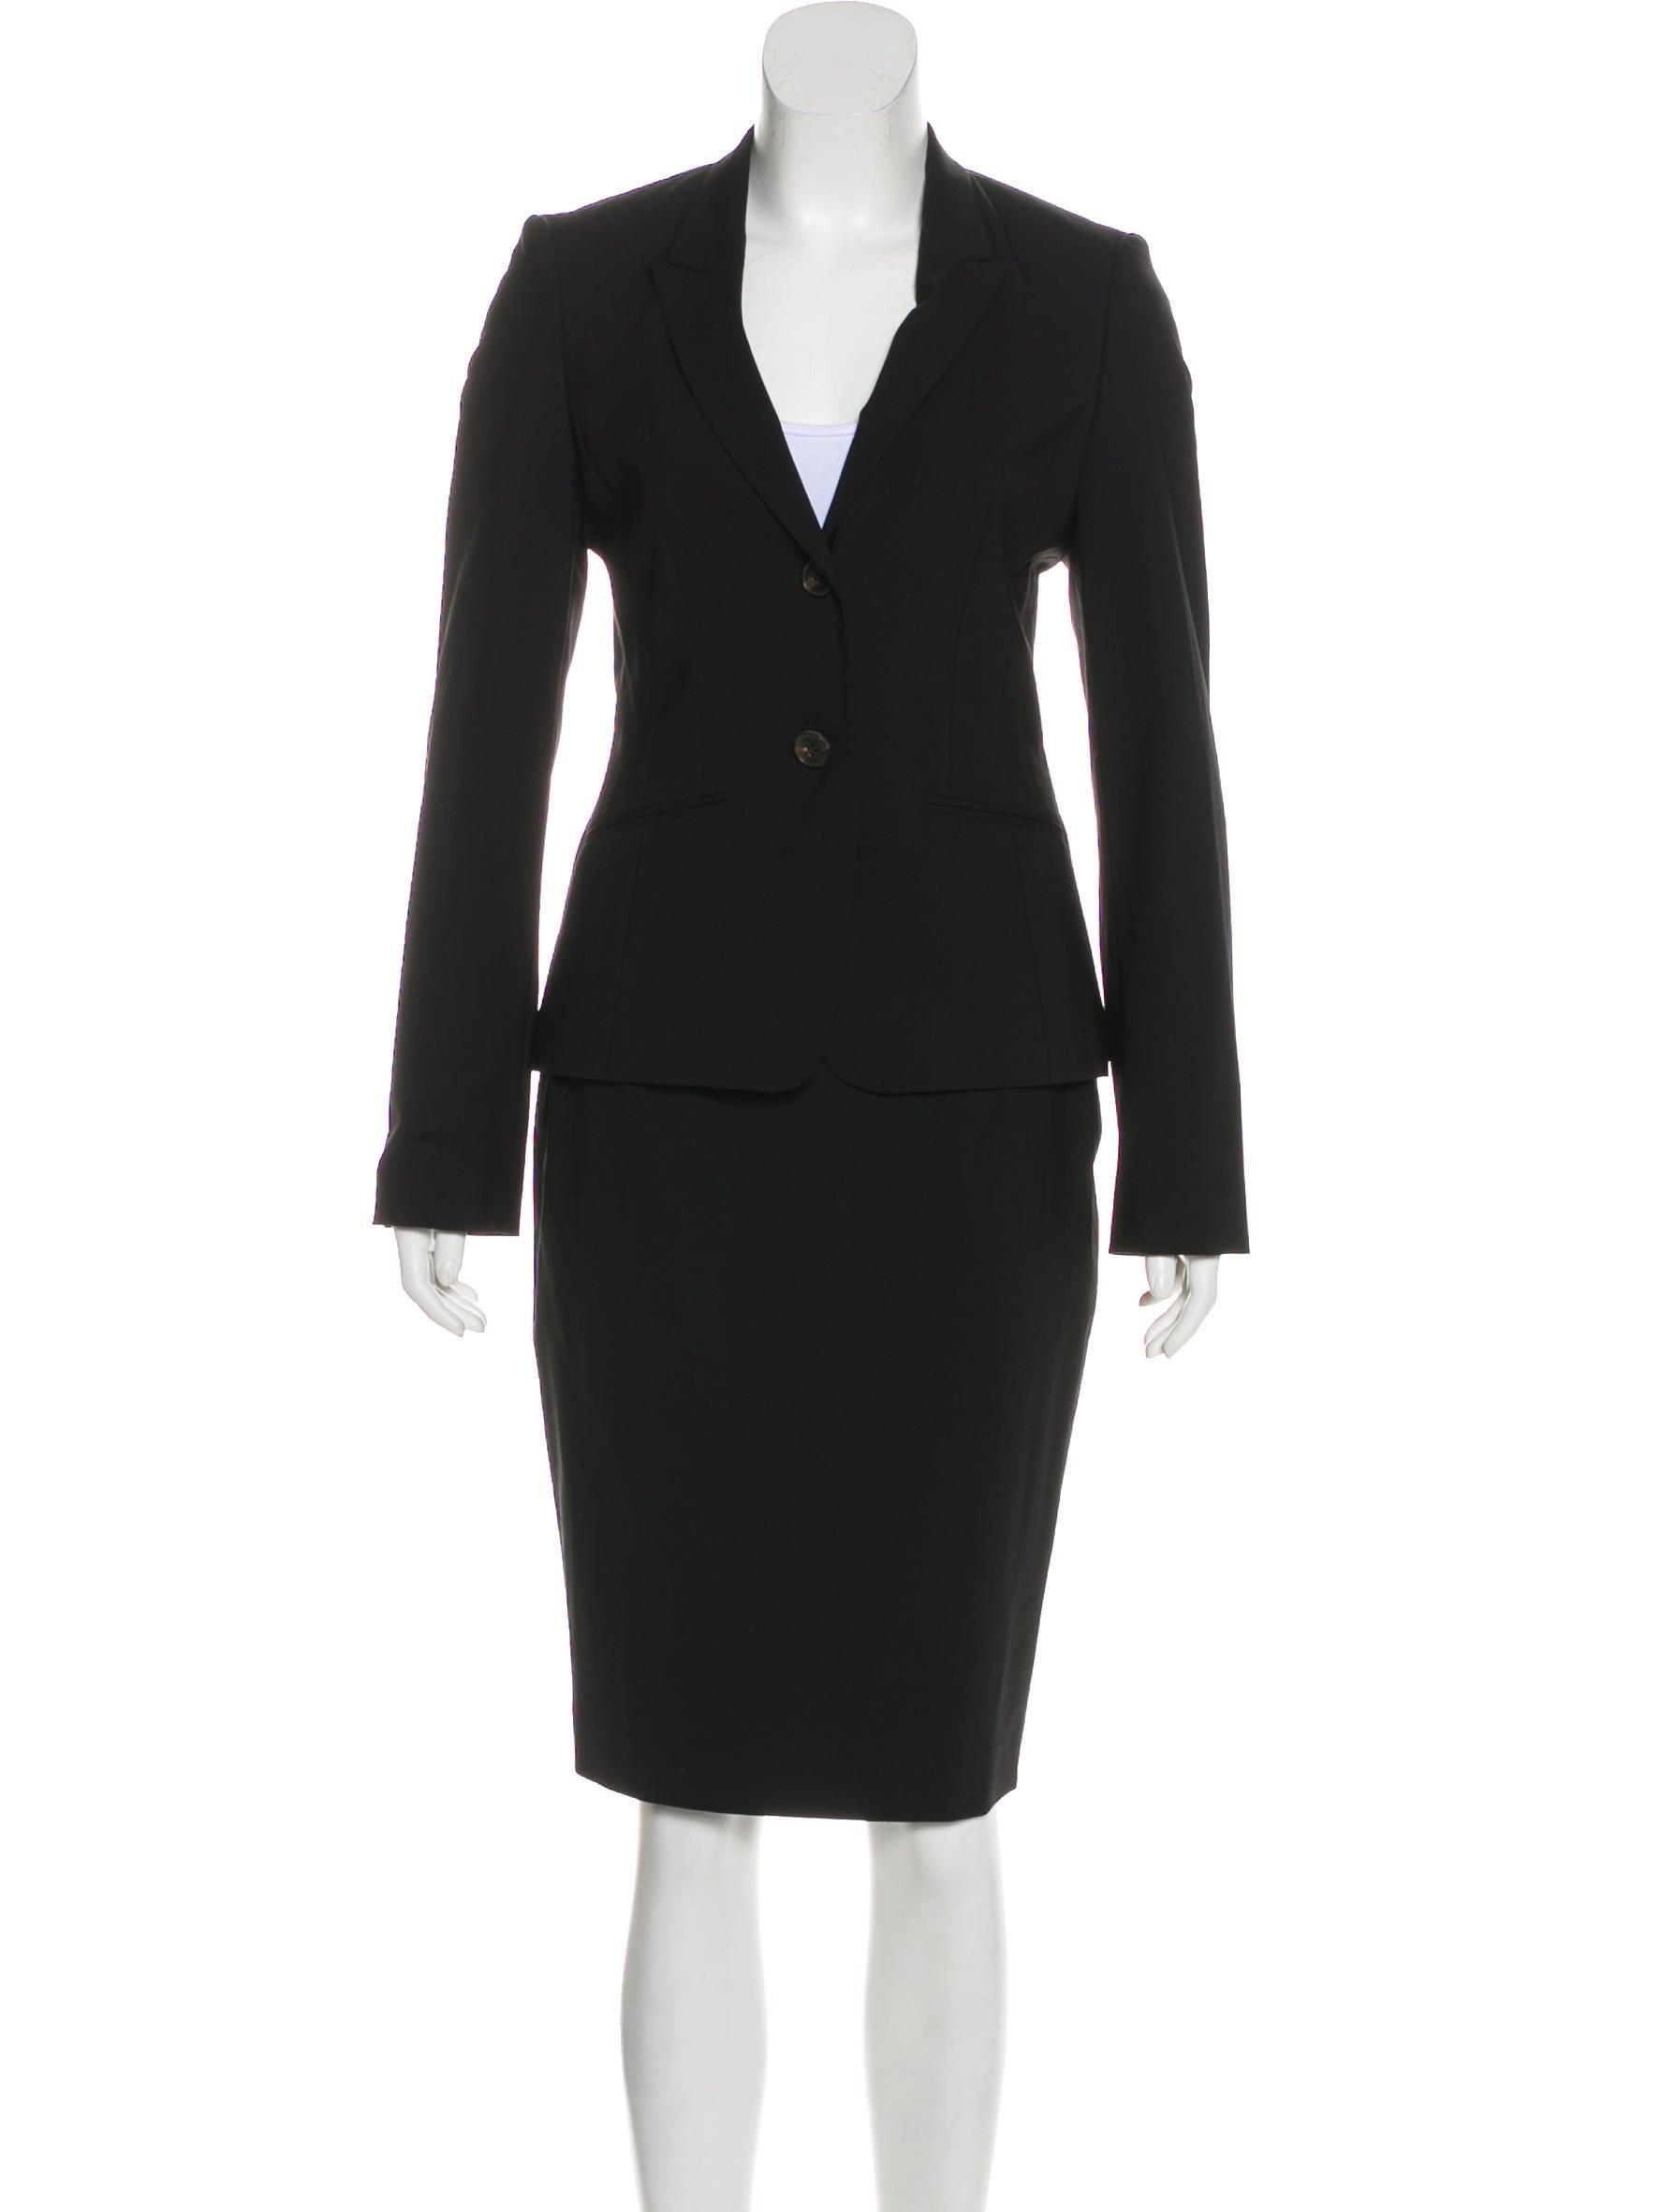 bcb62fbe5 Boss by Hugo Boss Virgin Wool Skirt Suit - Clothing - WBSSH21217 ...